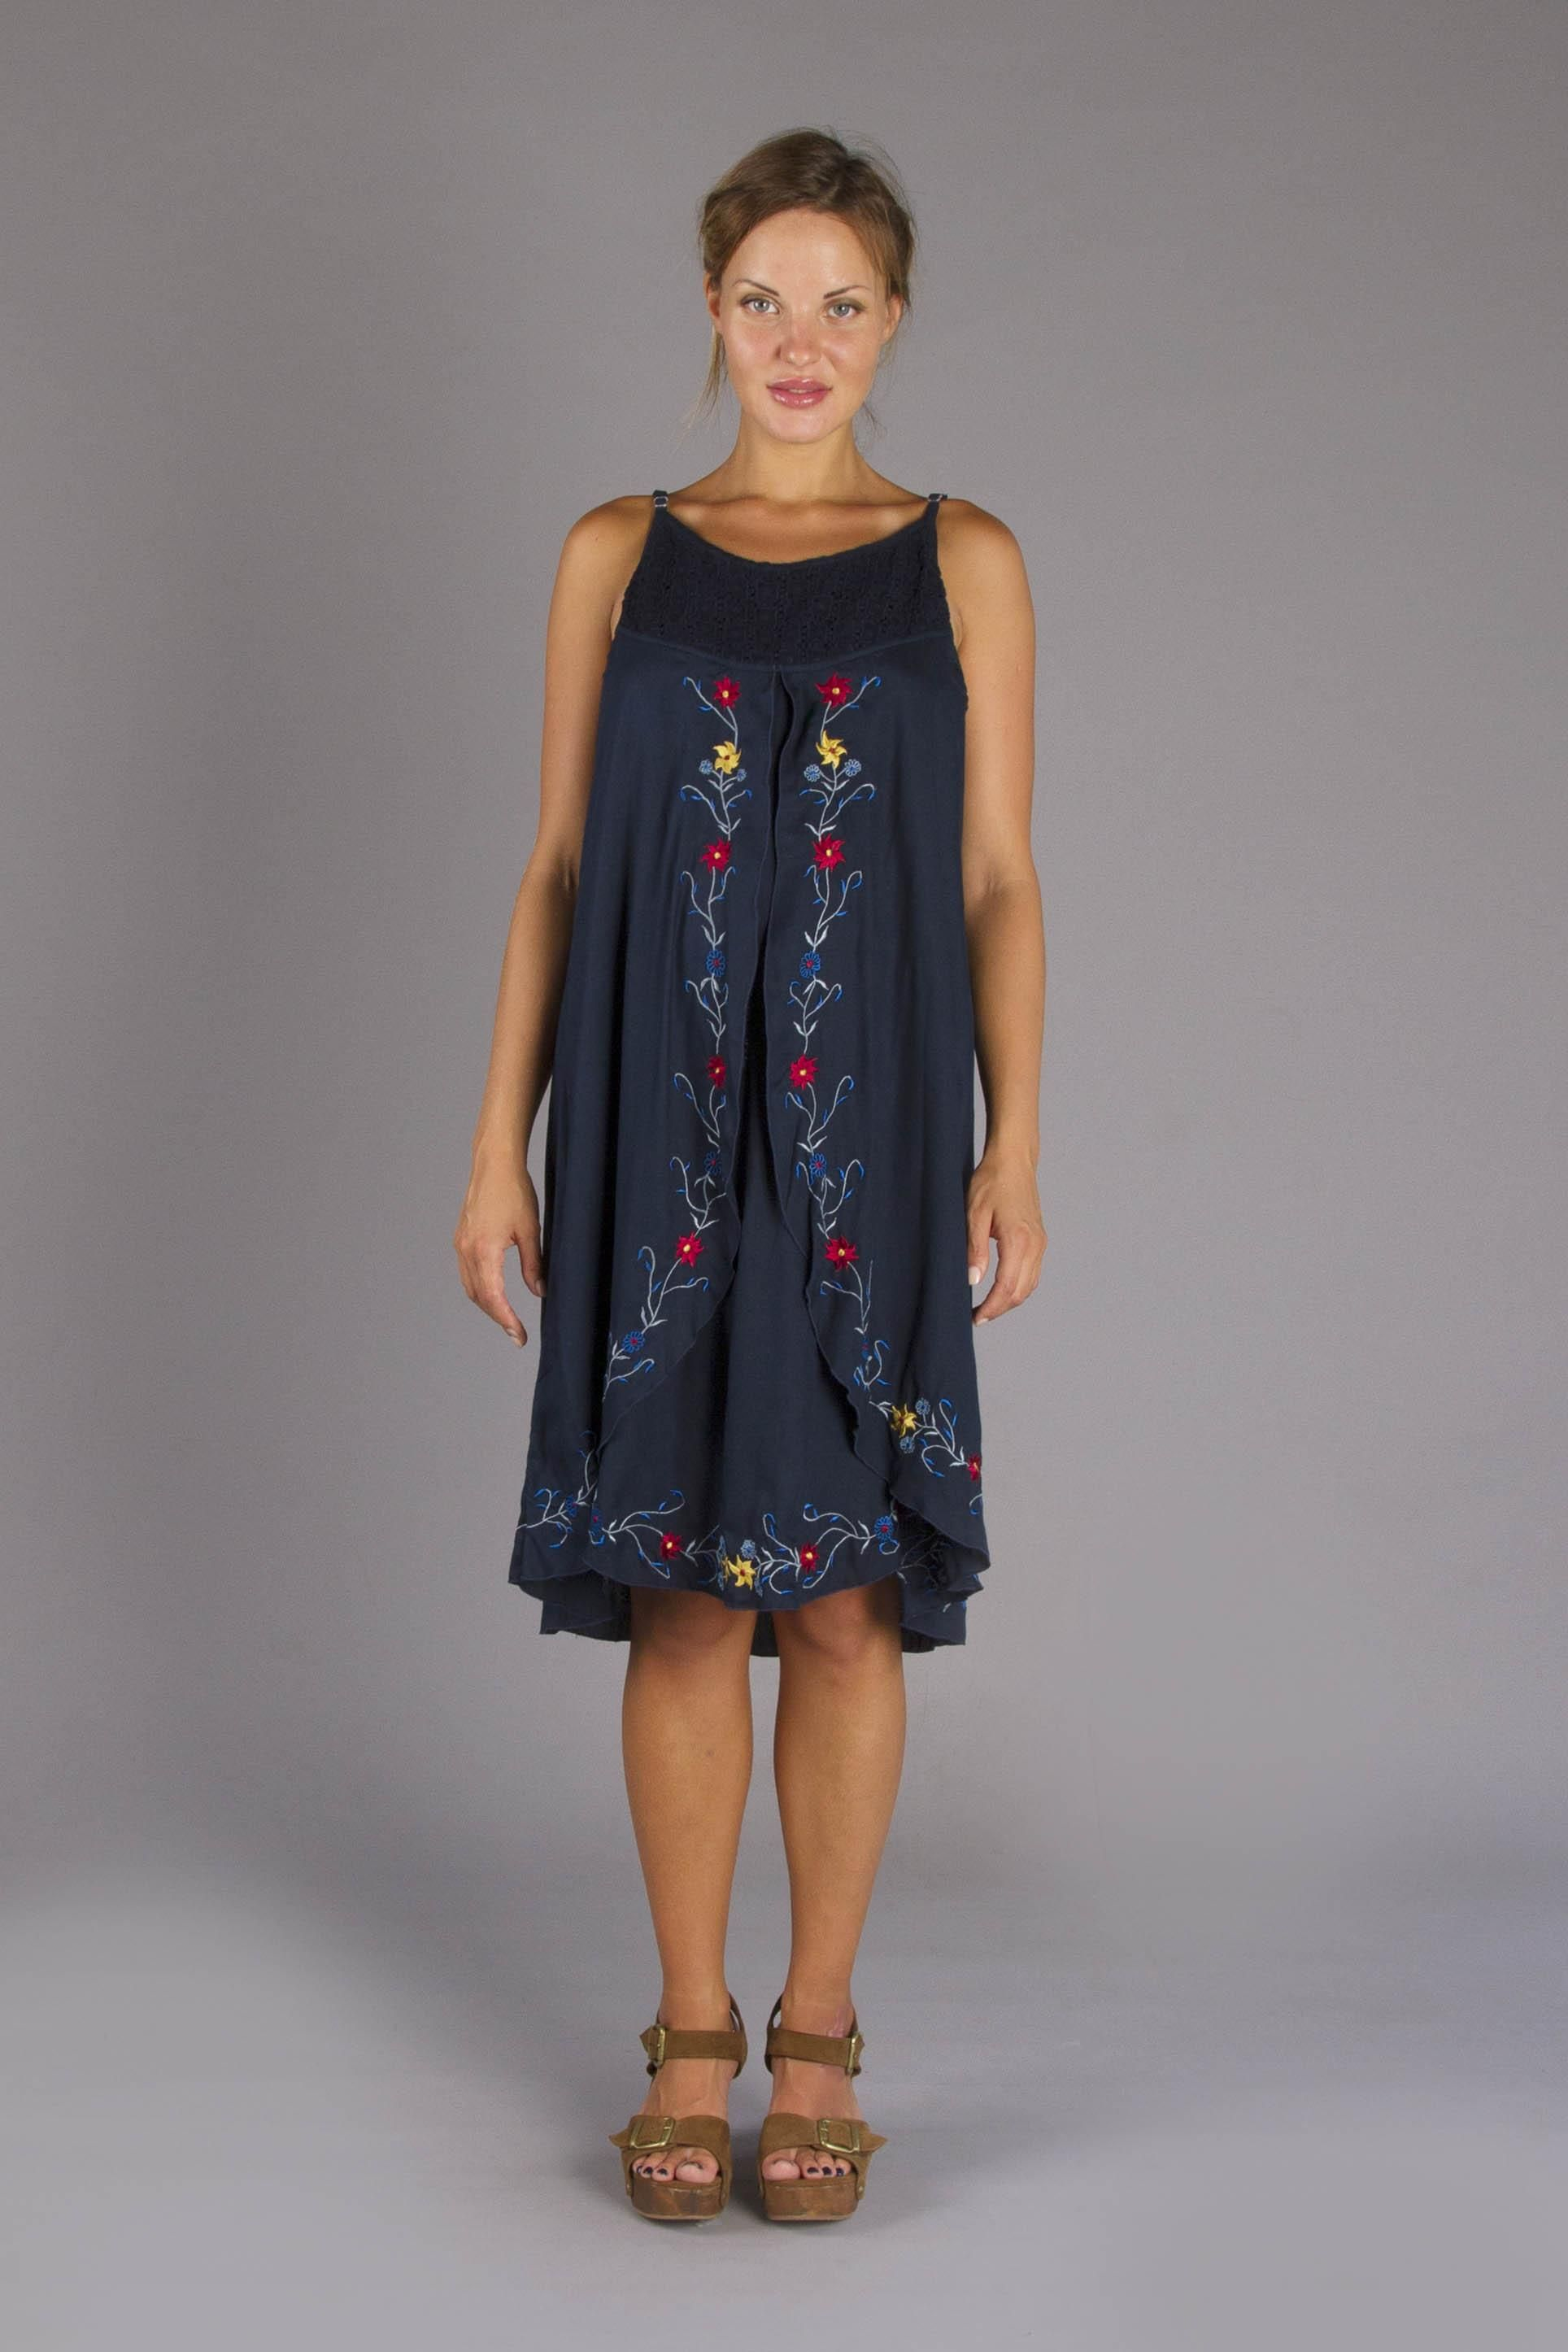 boho maternity dress australia